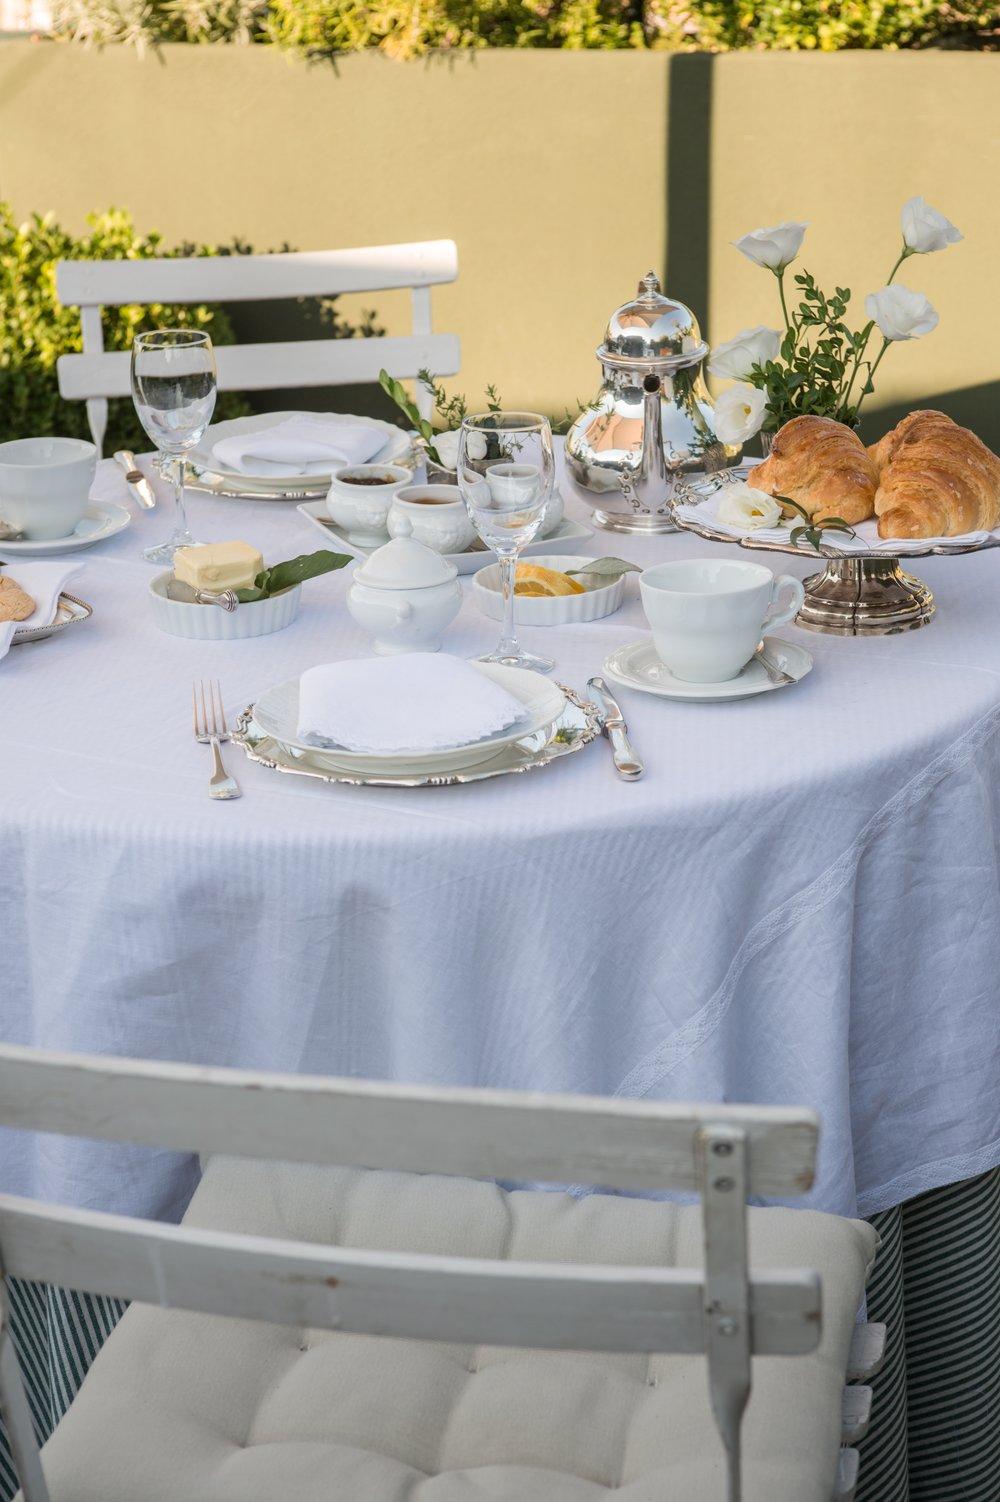 Garden Suite - breakfast on the terrace